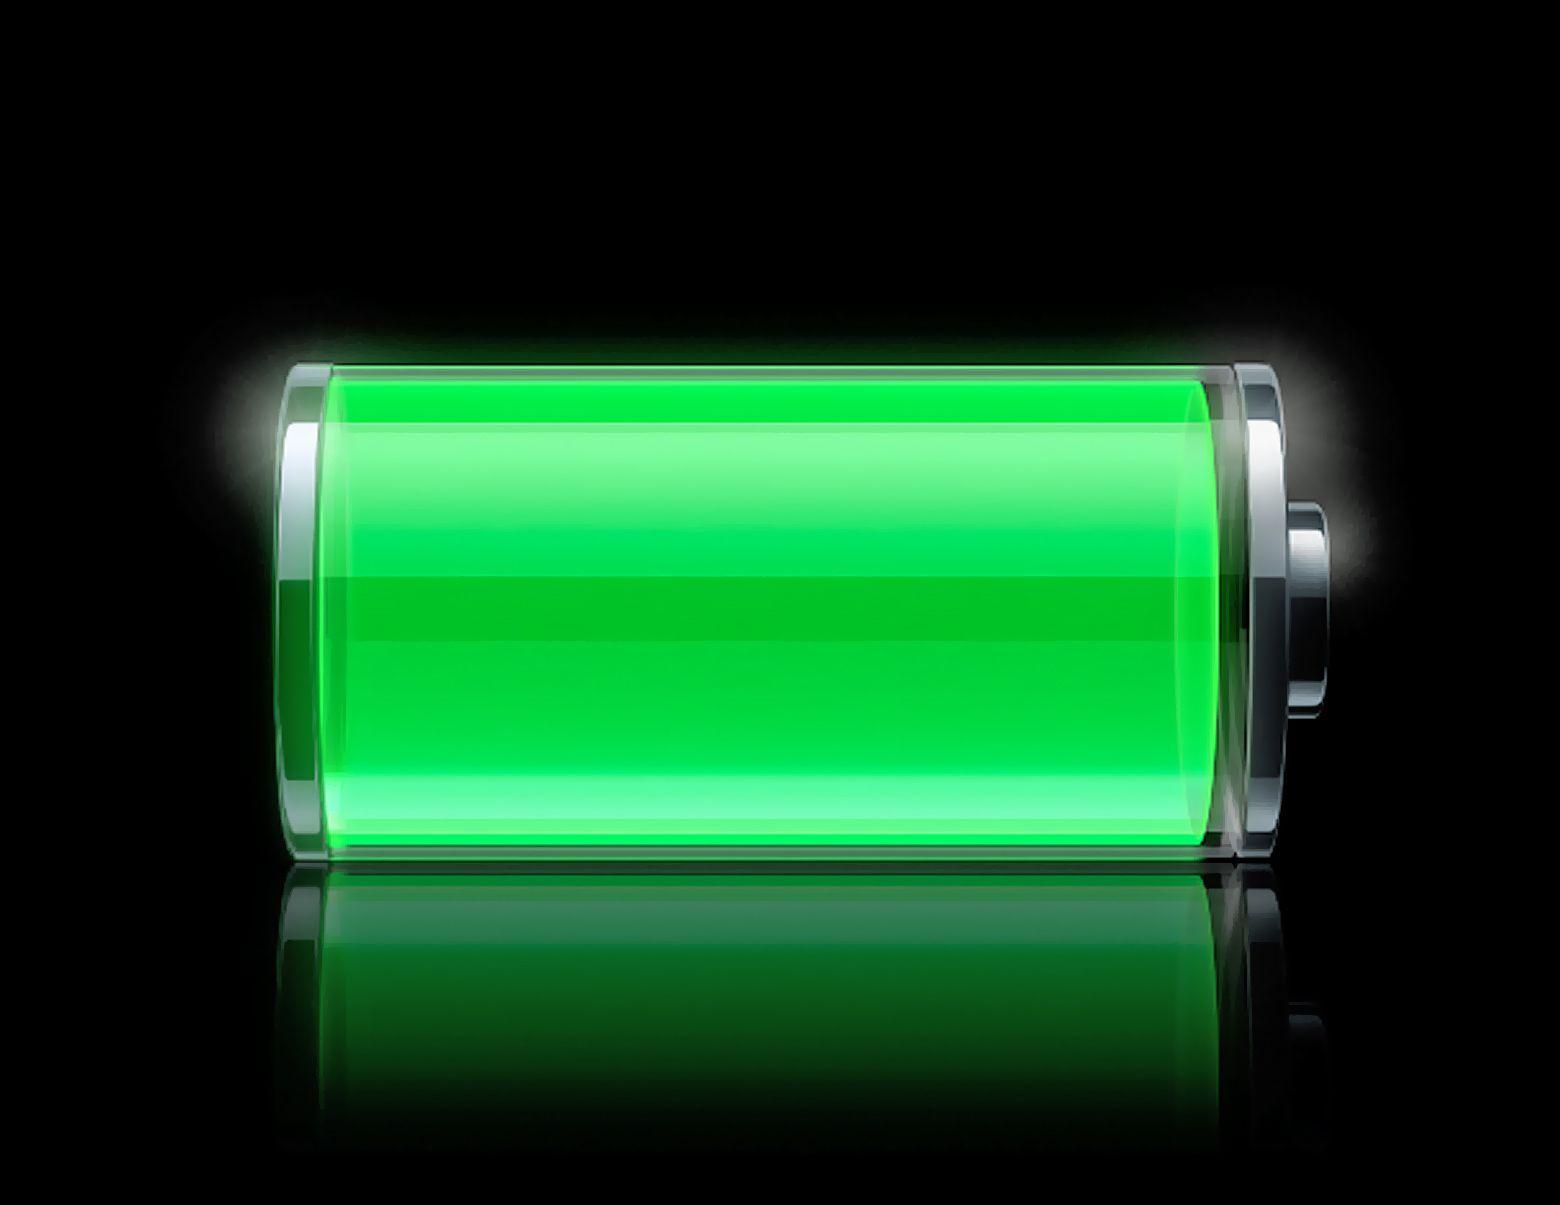 картинка на уровне заряда батареи приезжает курорт